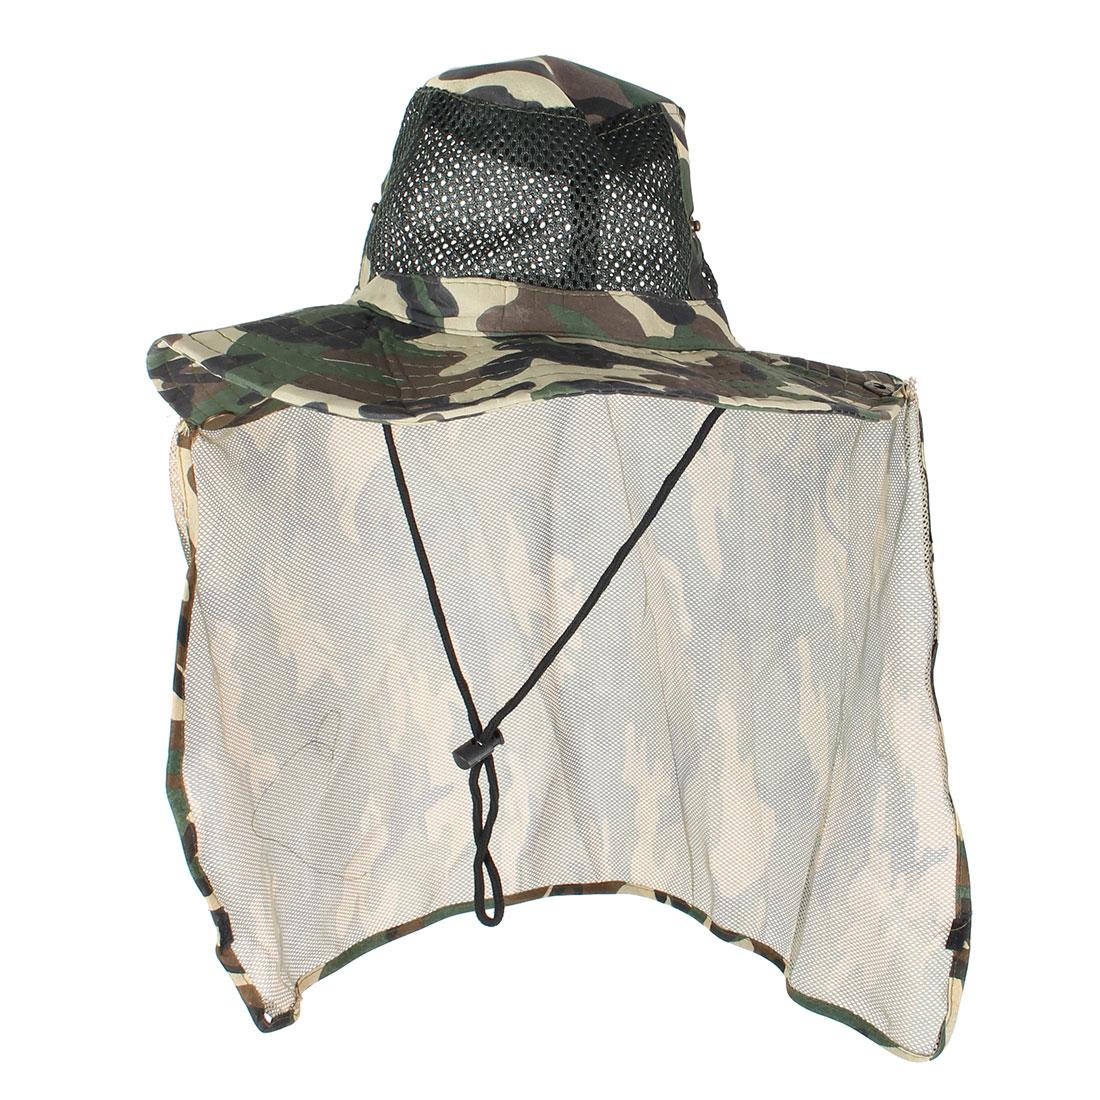 Unisex Camouflage Printed Mesh Design Sunbonnet Fishing Hat Cap